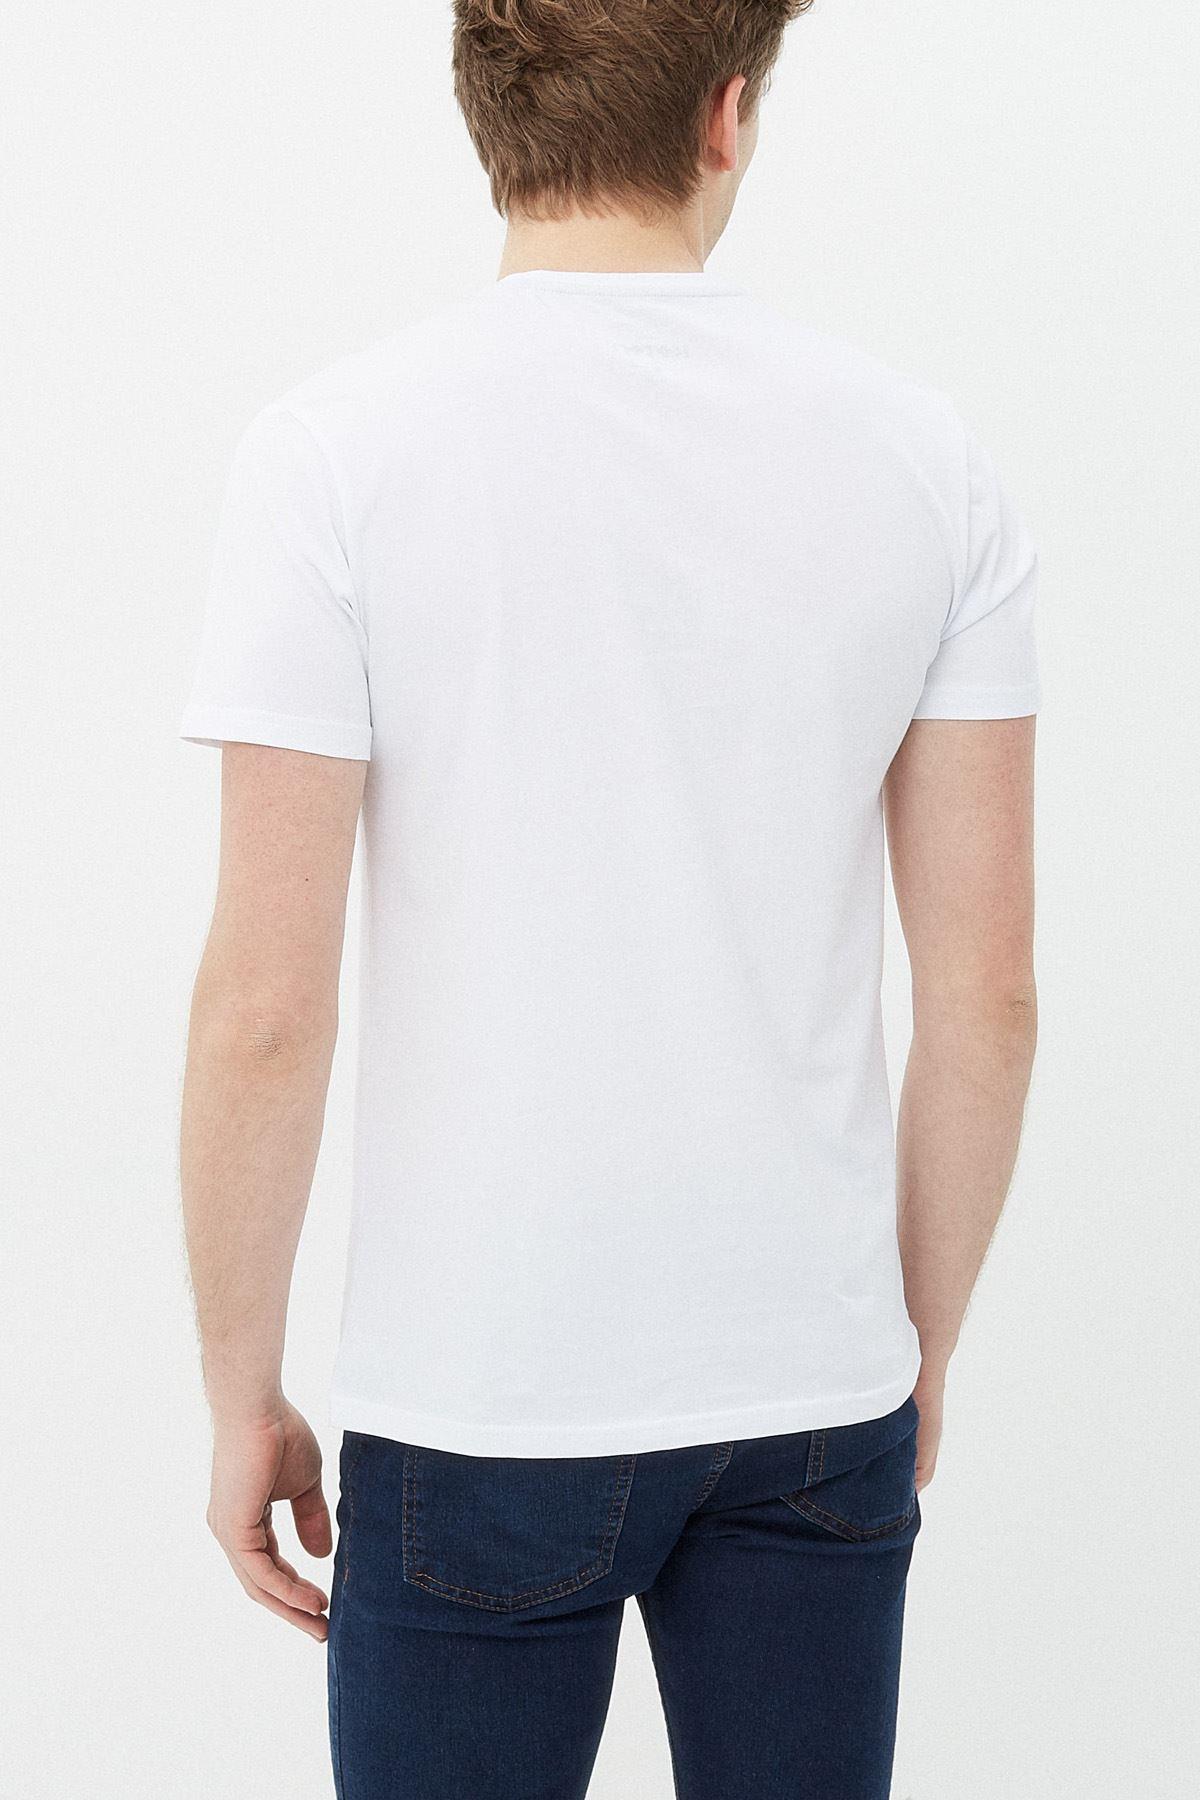 Anime Death Note 12 Beyaz Erkek Tshirt - Tişört